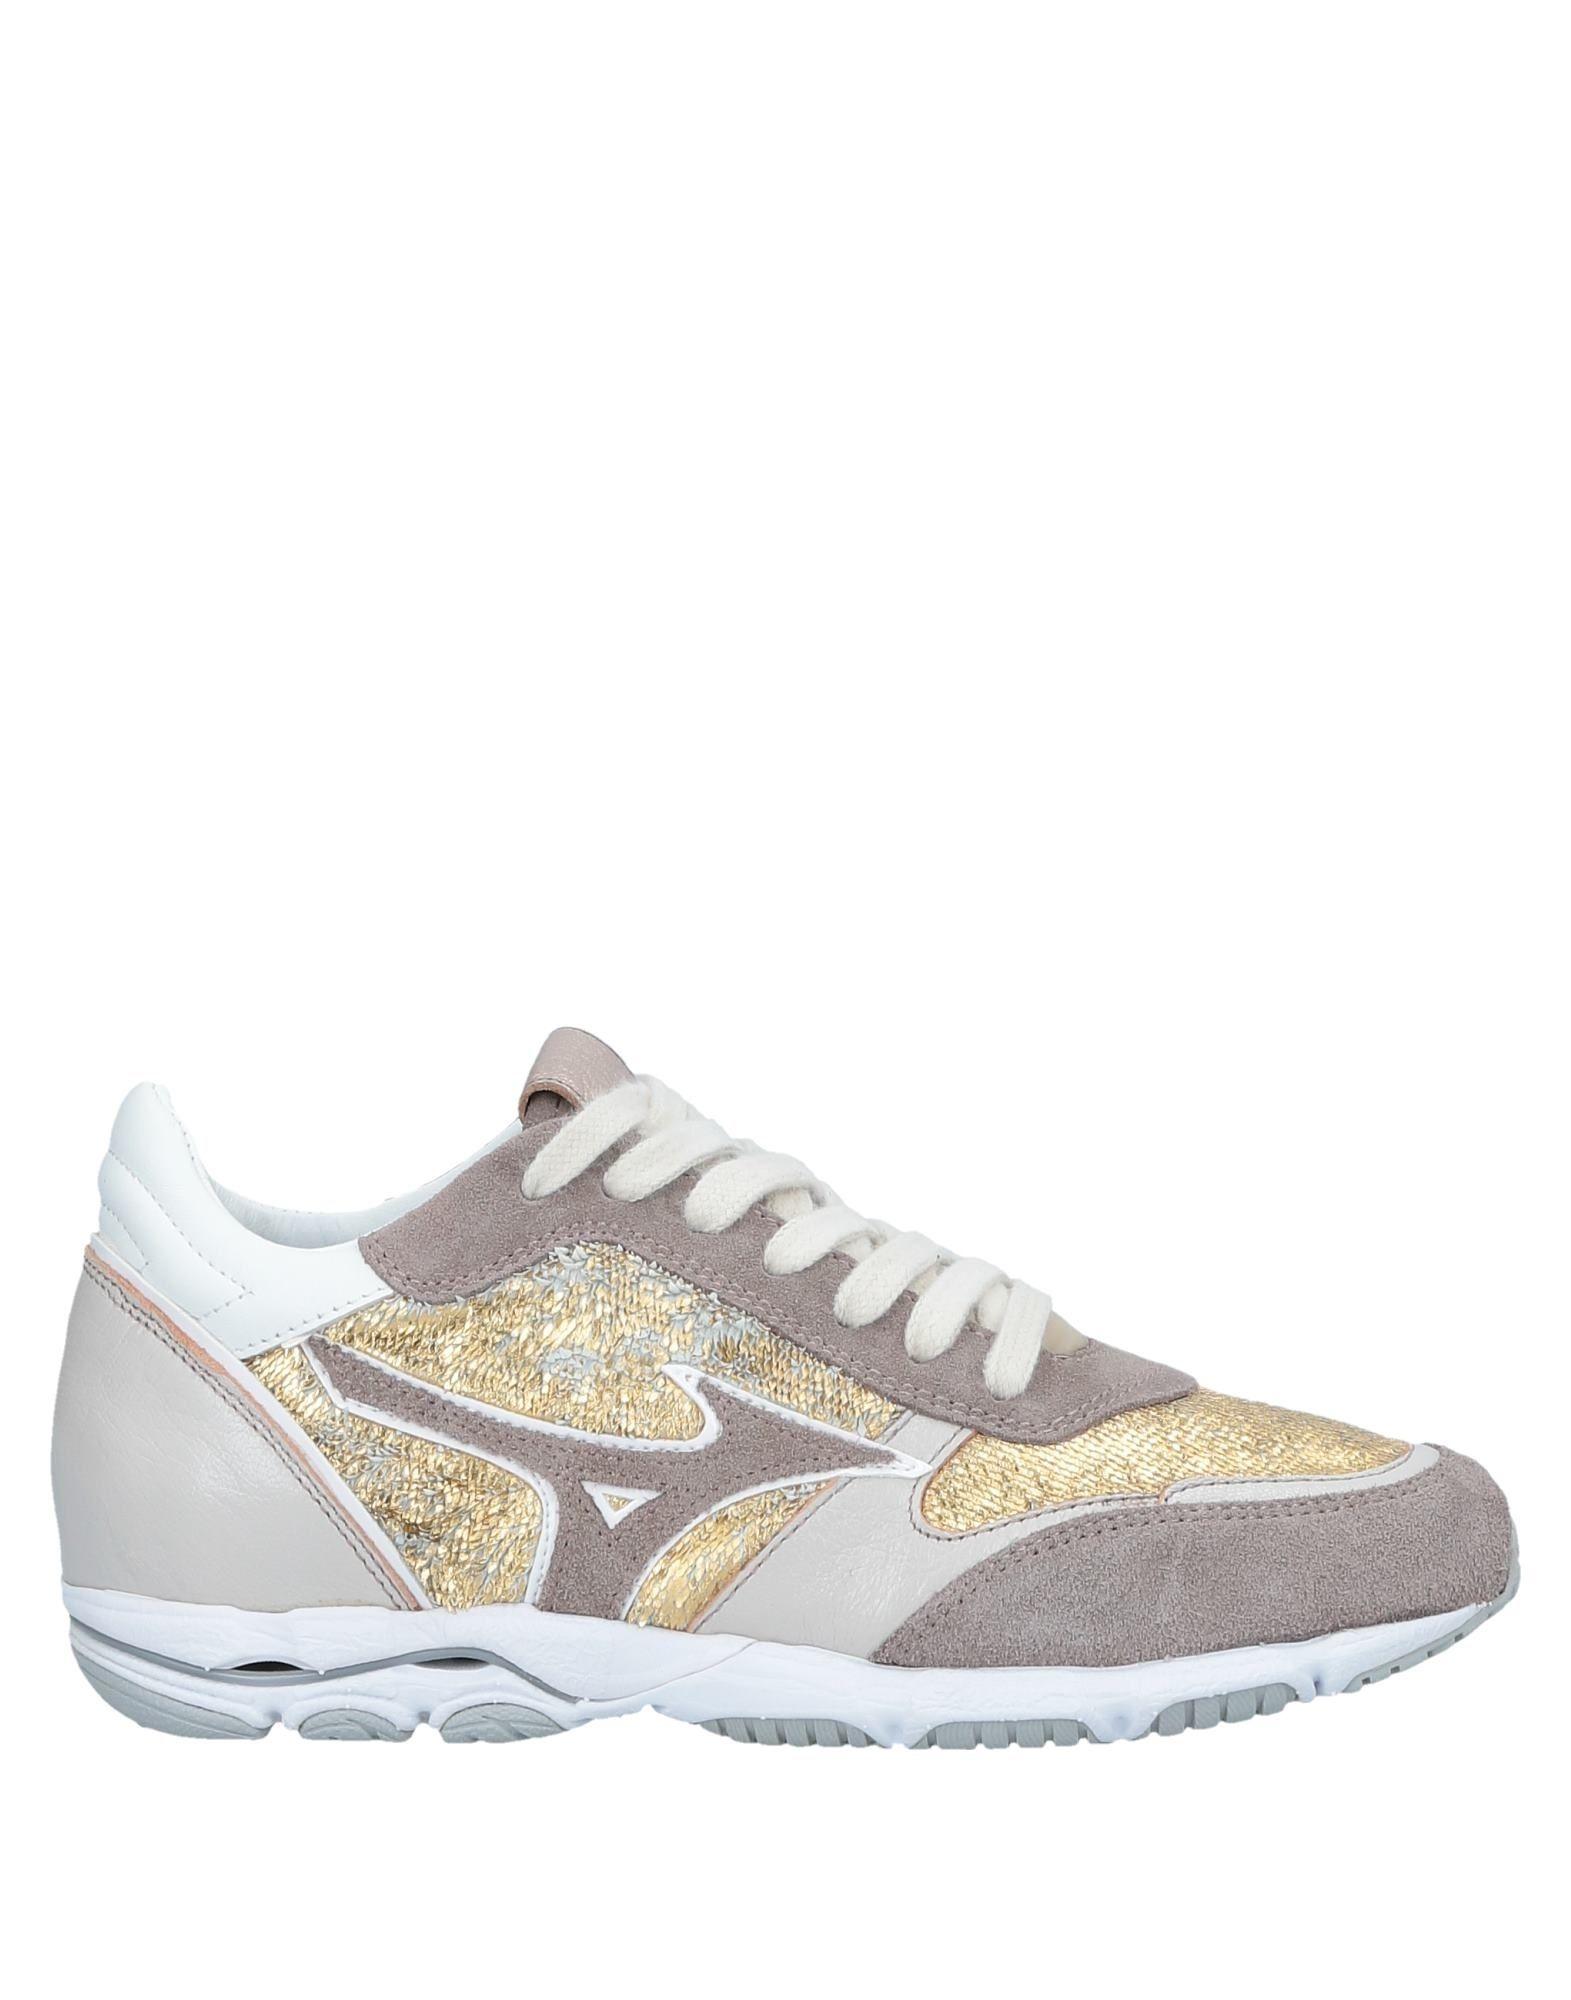 Mizuno Sneakers Damen  11527818HV Gute Qualität beliebte Schuhe